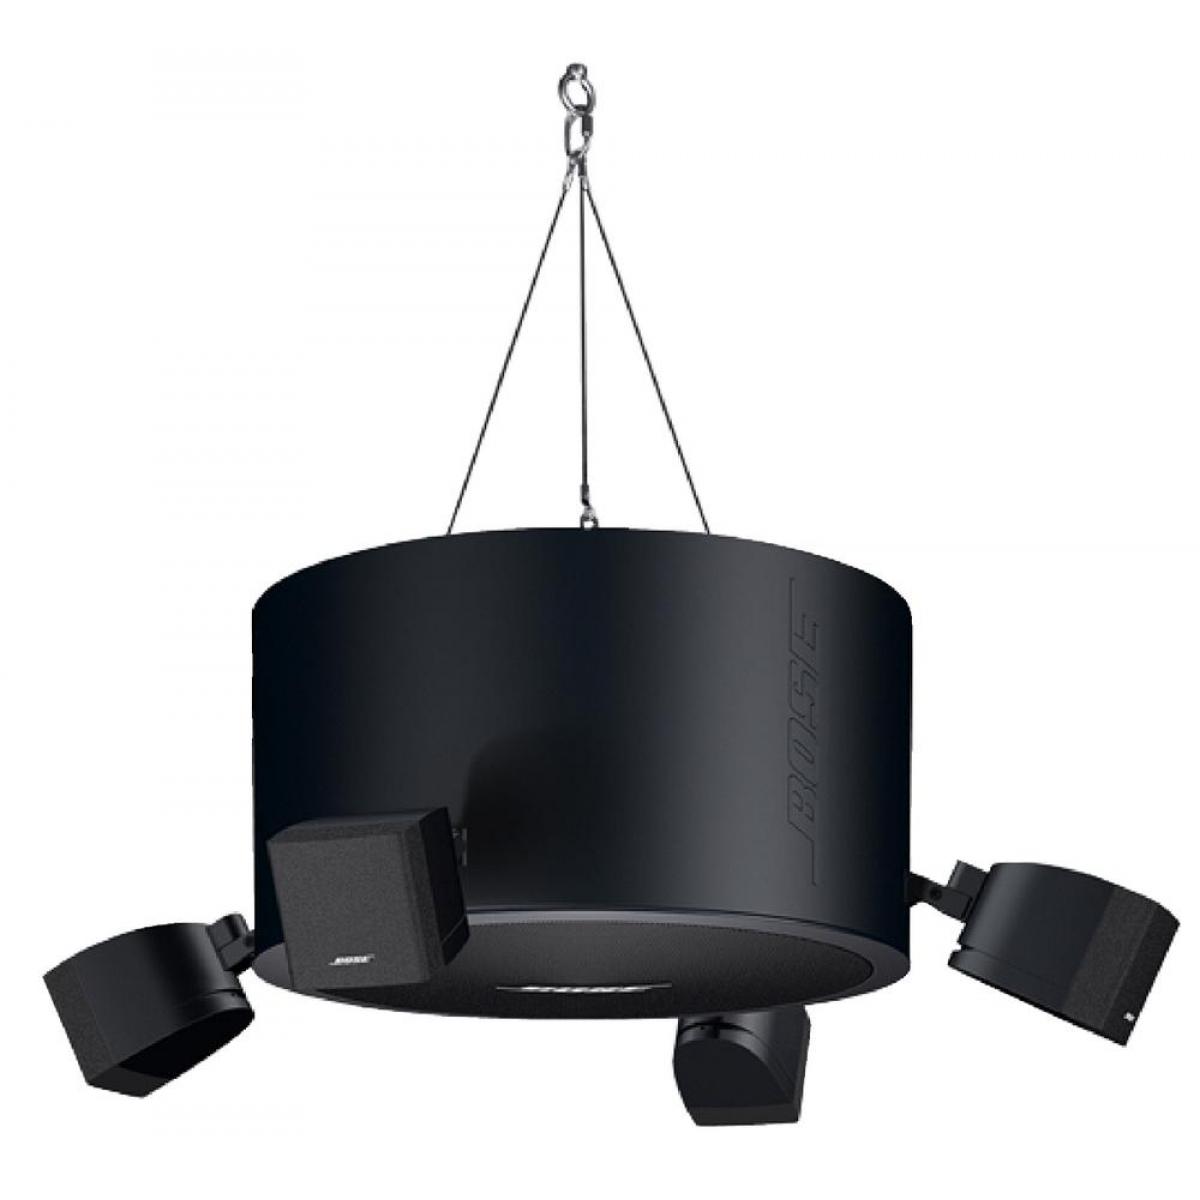 tmp pro distribution freespace 3 pendant mount